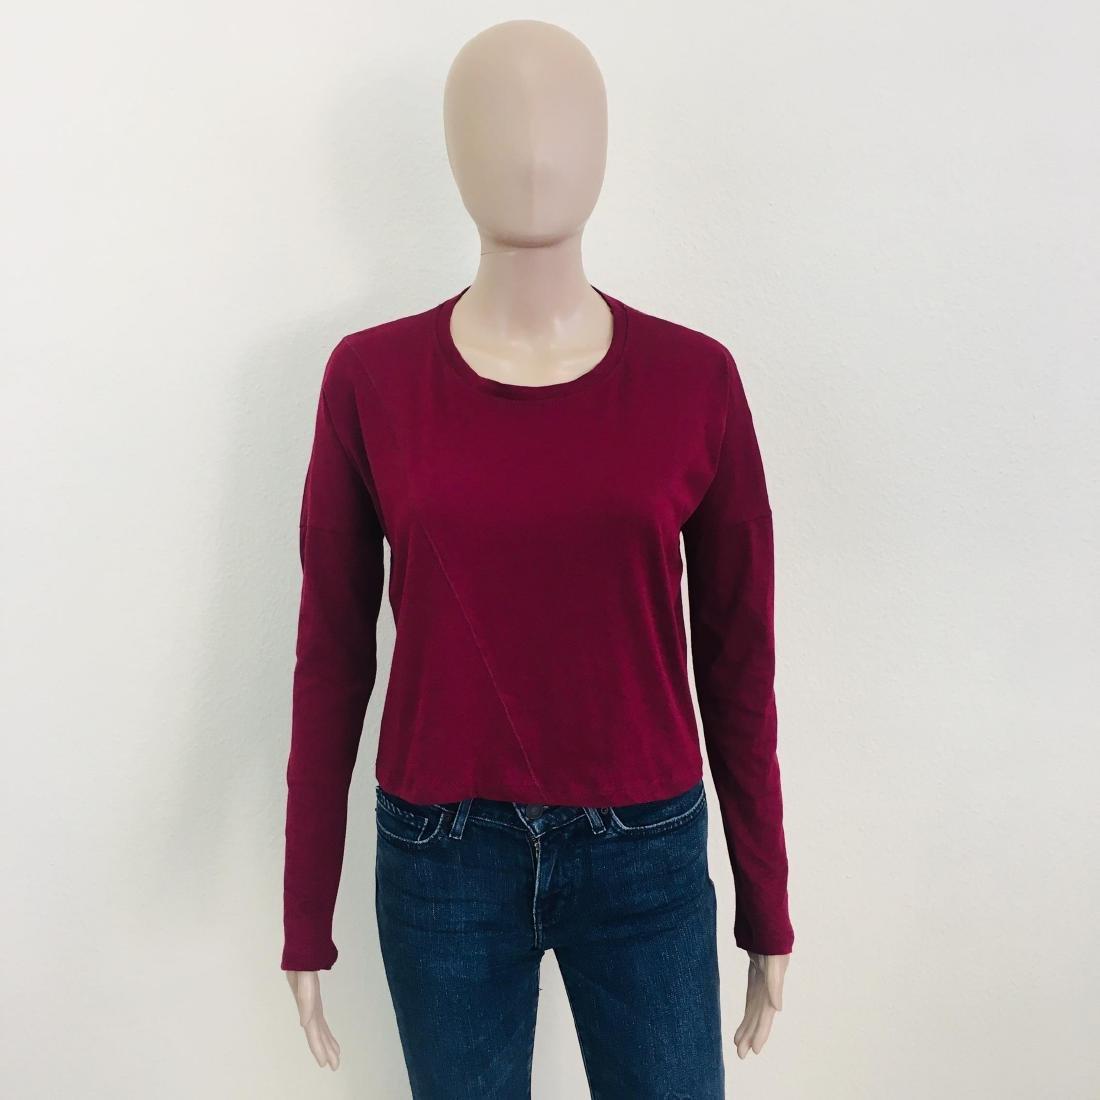 New Women's ZARA Top Blouse Size S